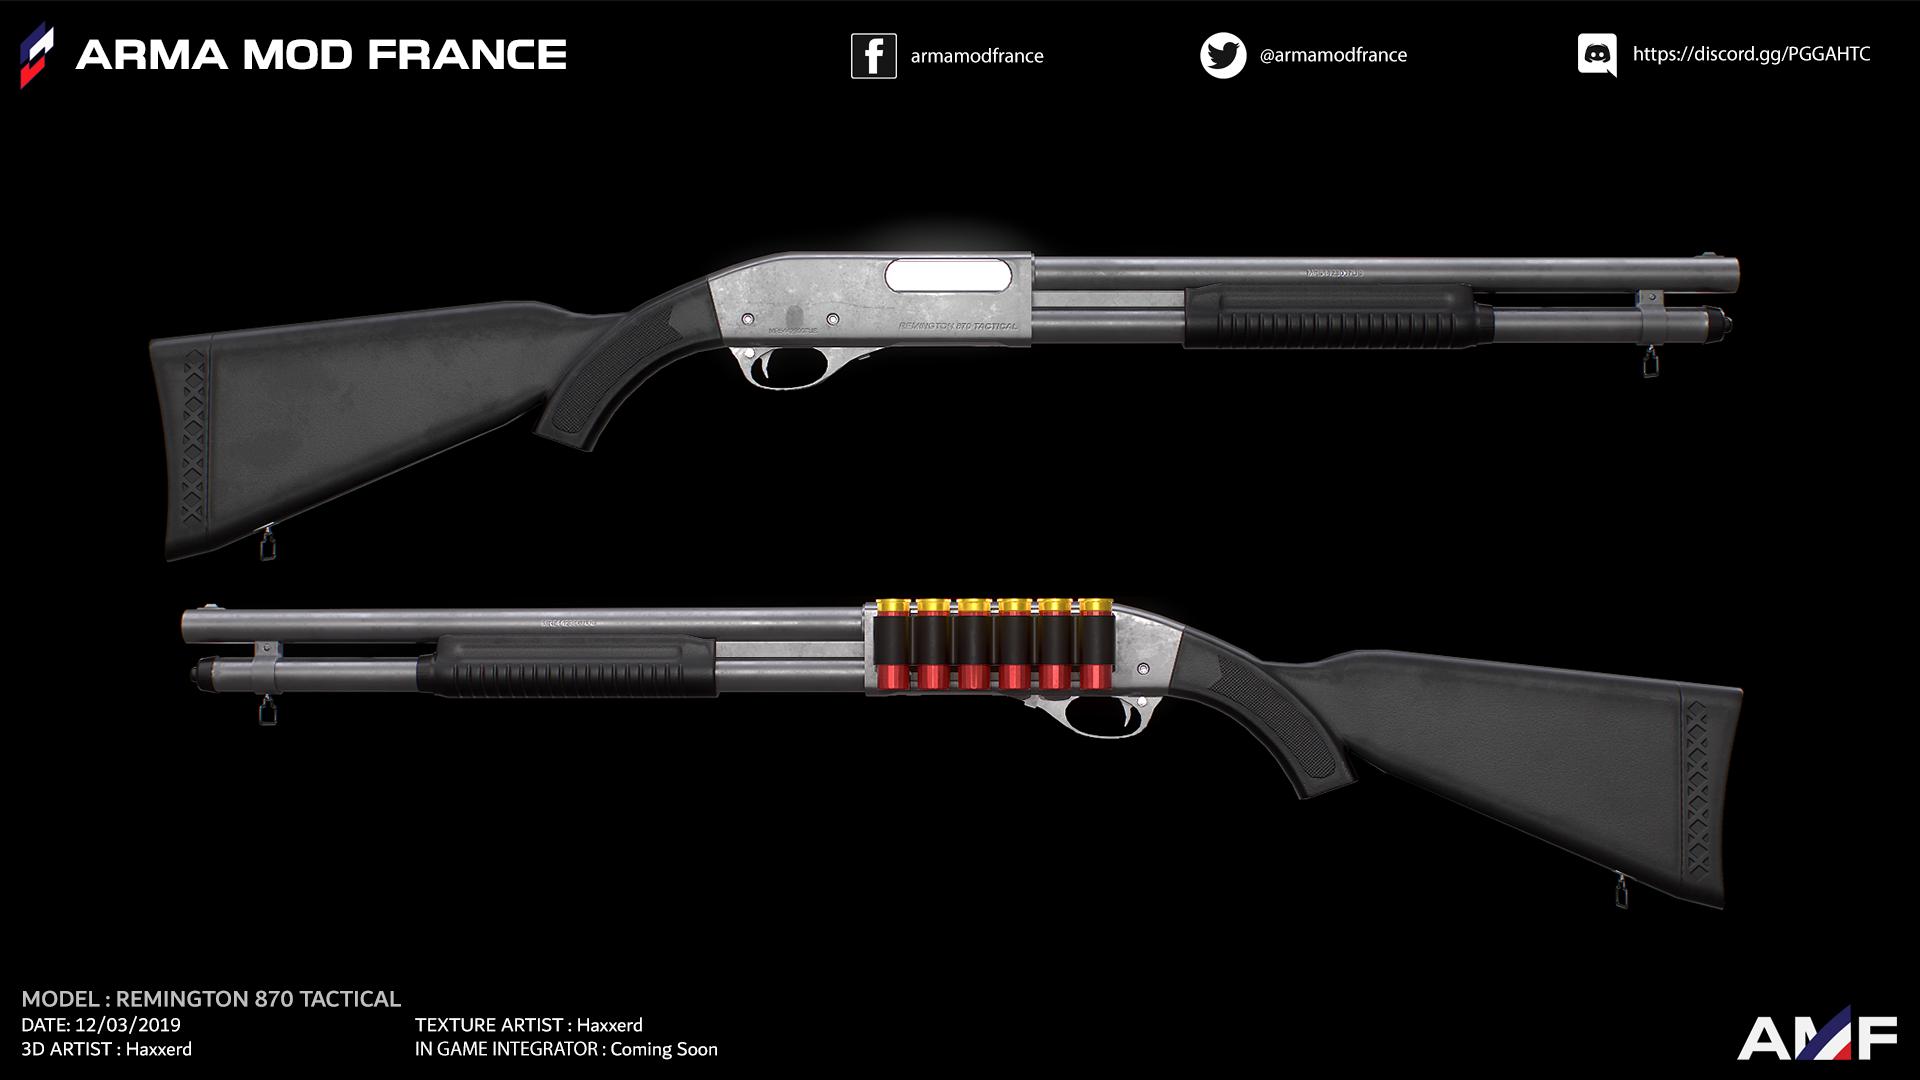 remington870Tactical01.png